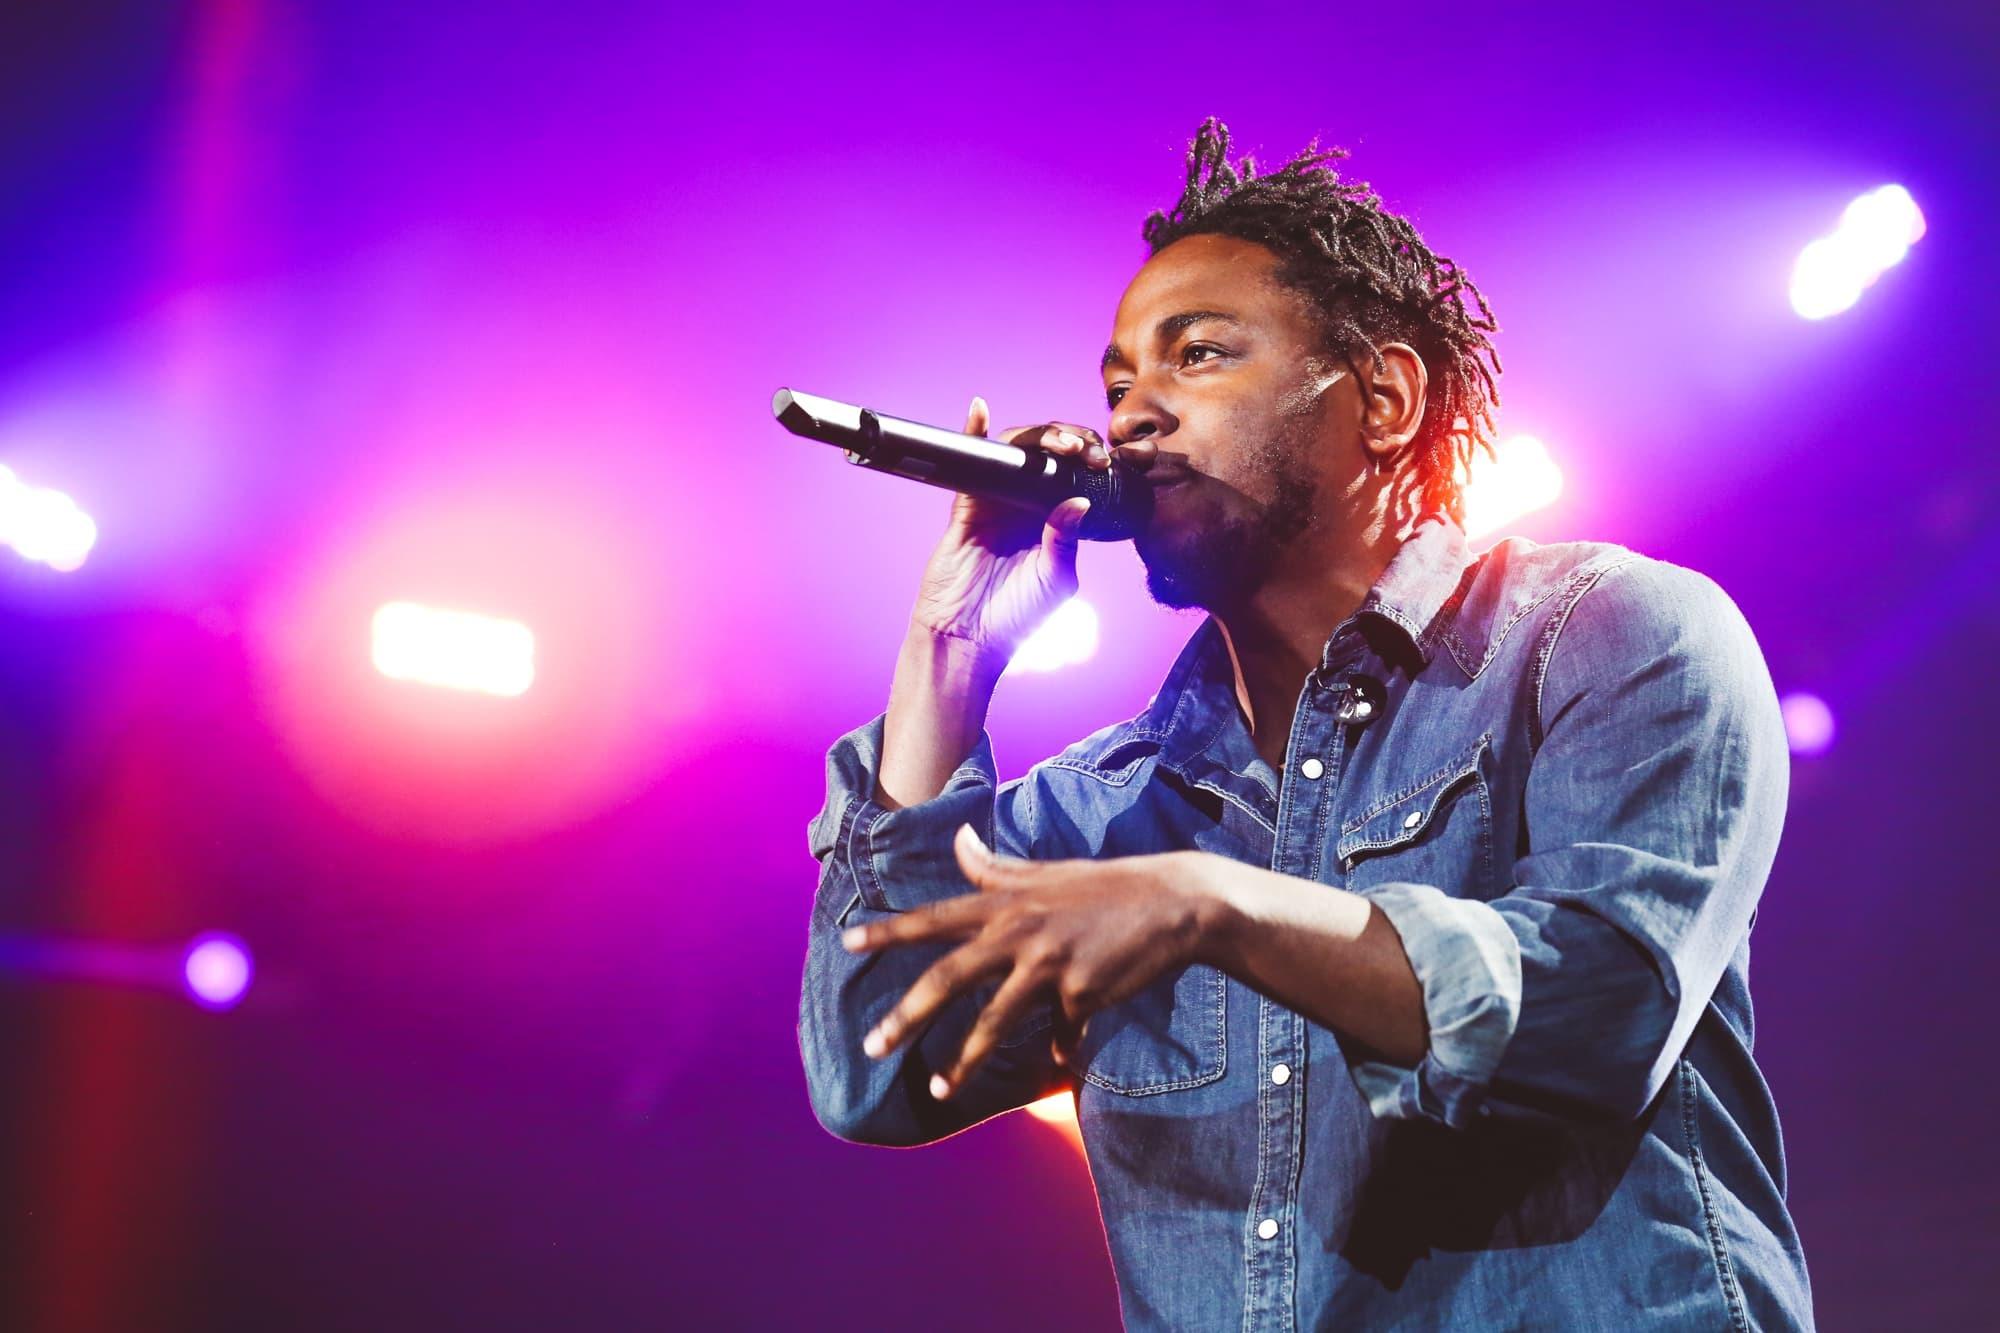 Kendrick Lamar Wallpaper